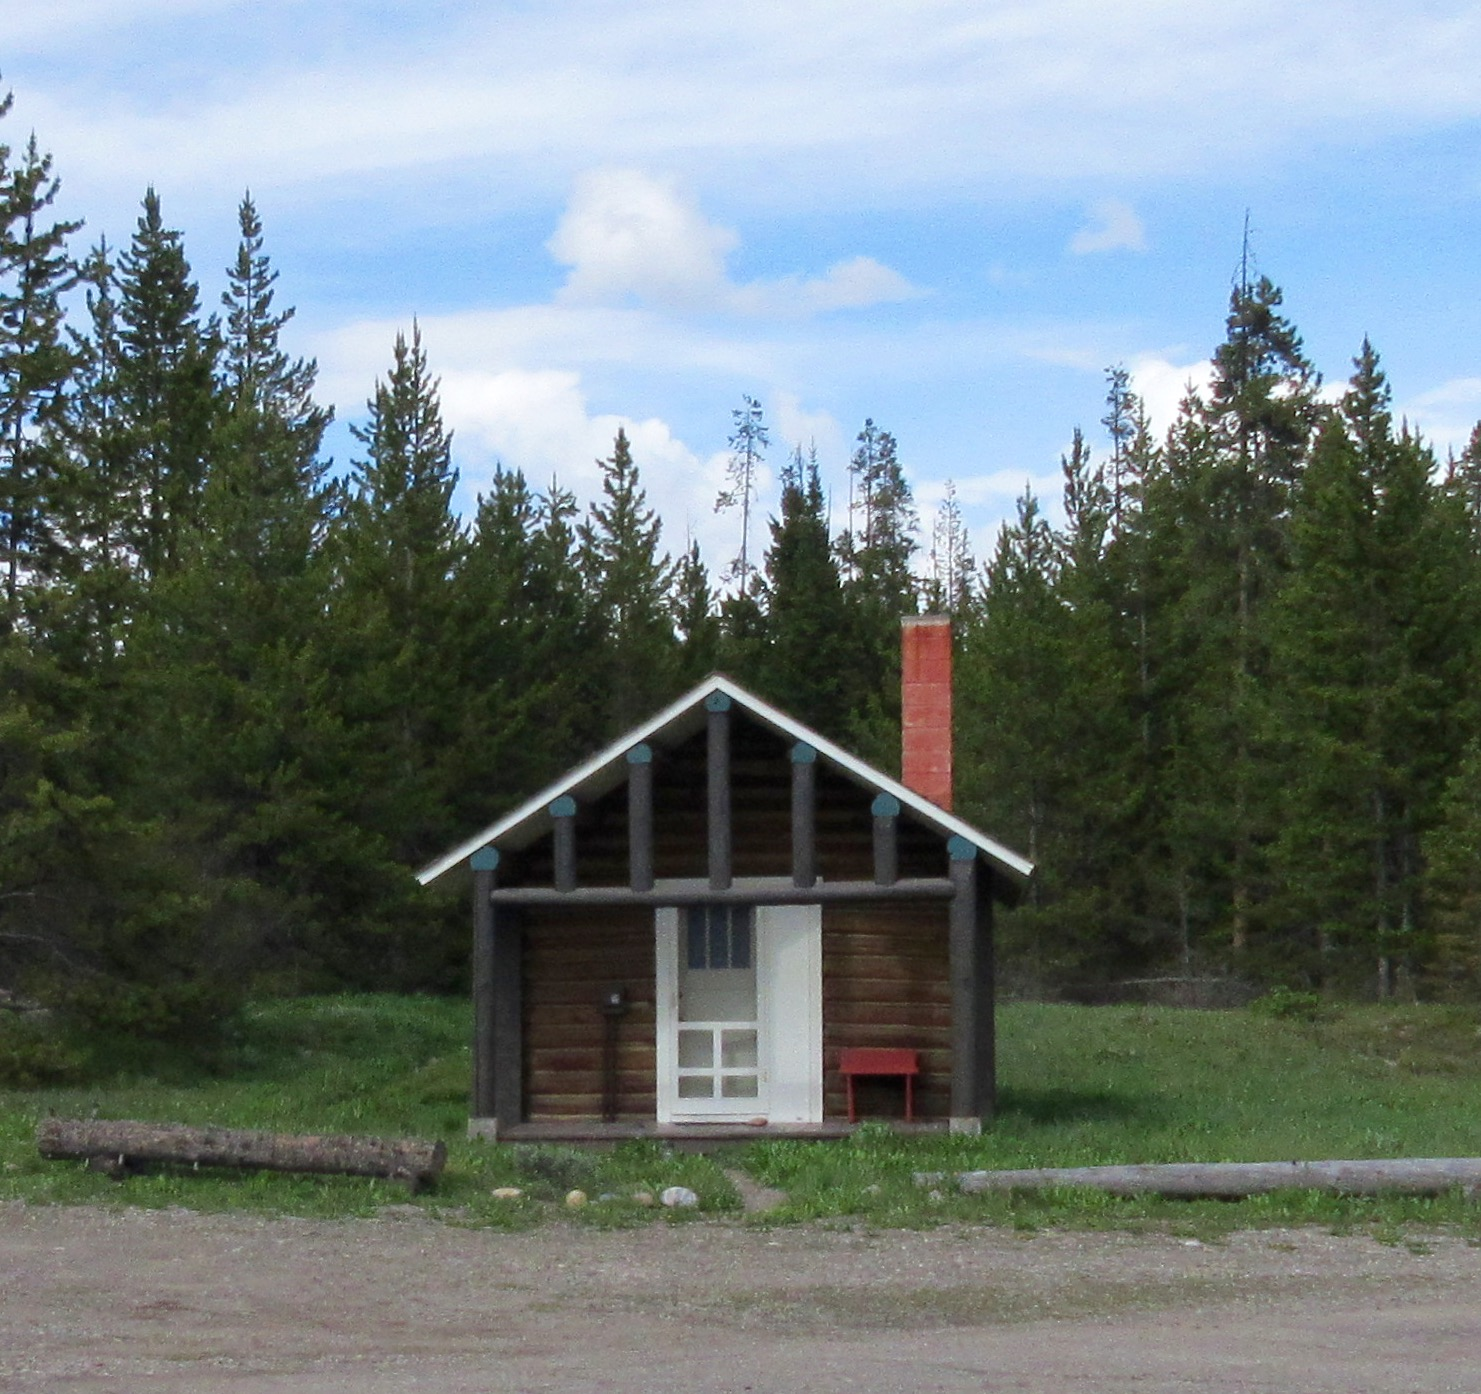 The Tack Cabin